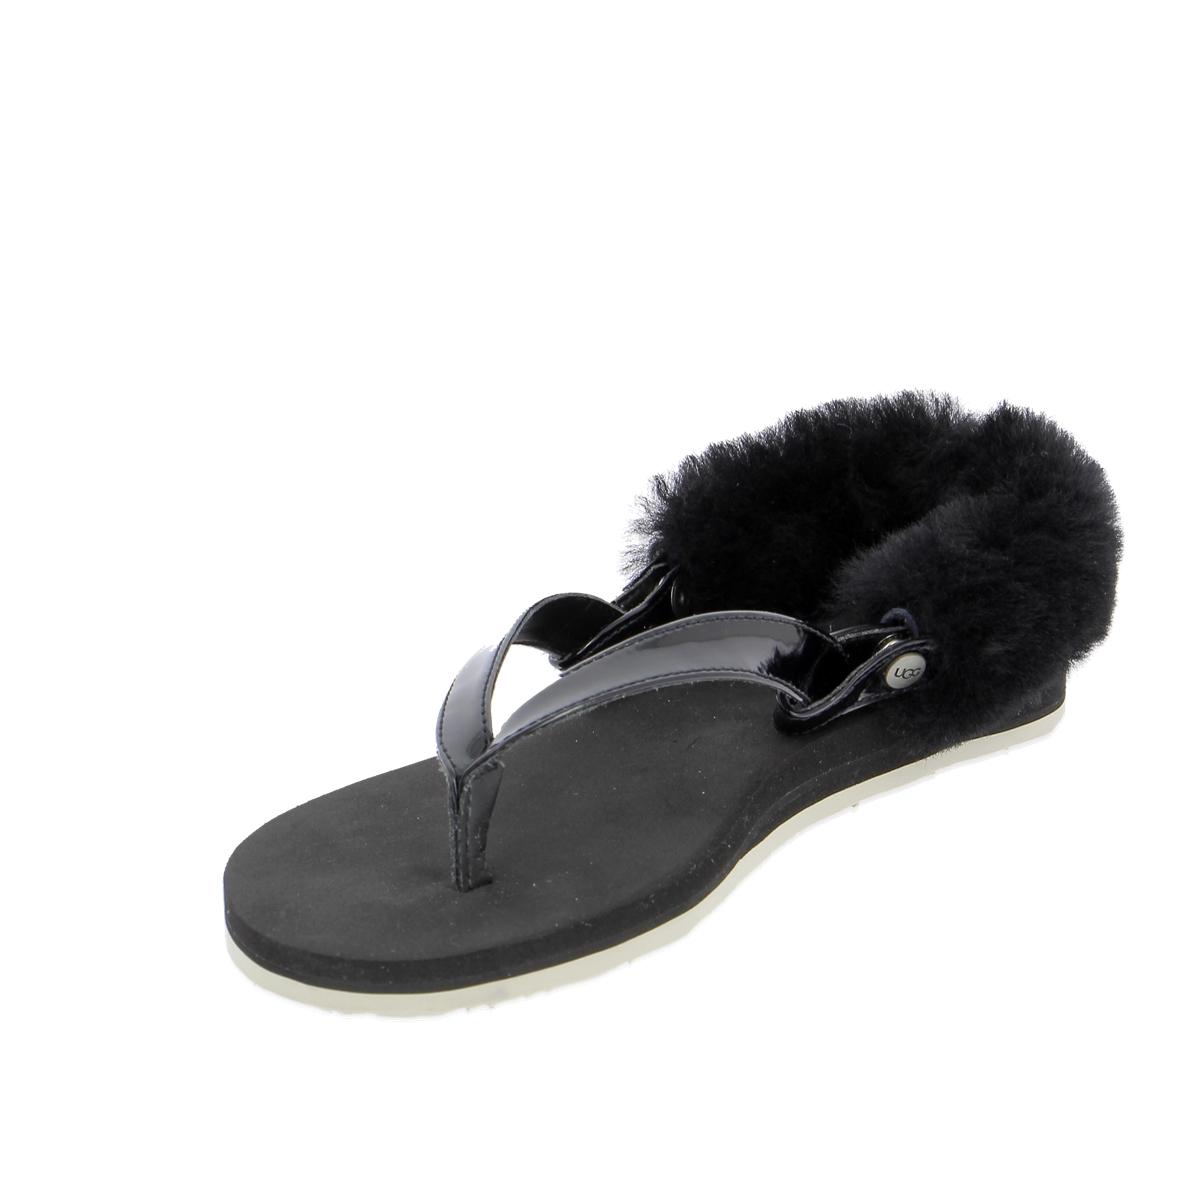 Ugg Muiltjes - slippers zwart